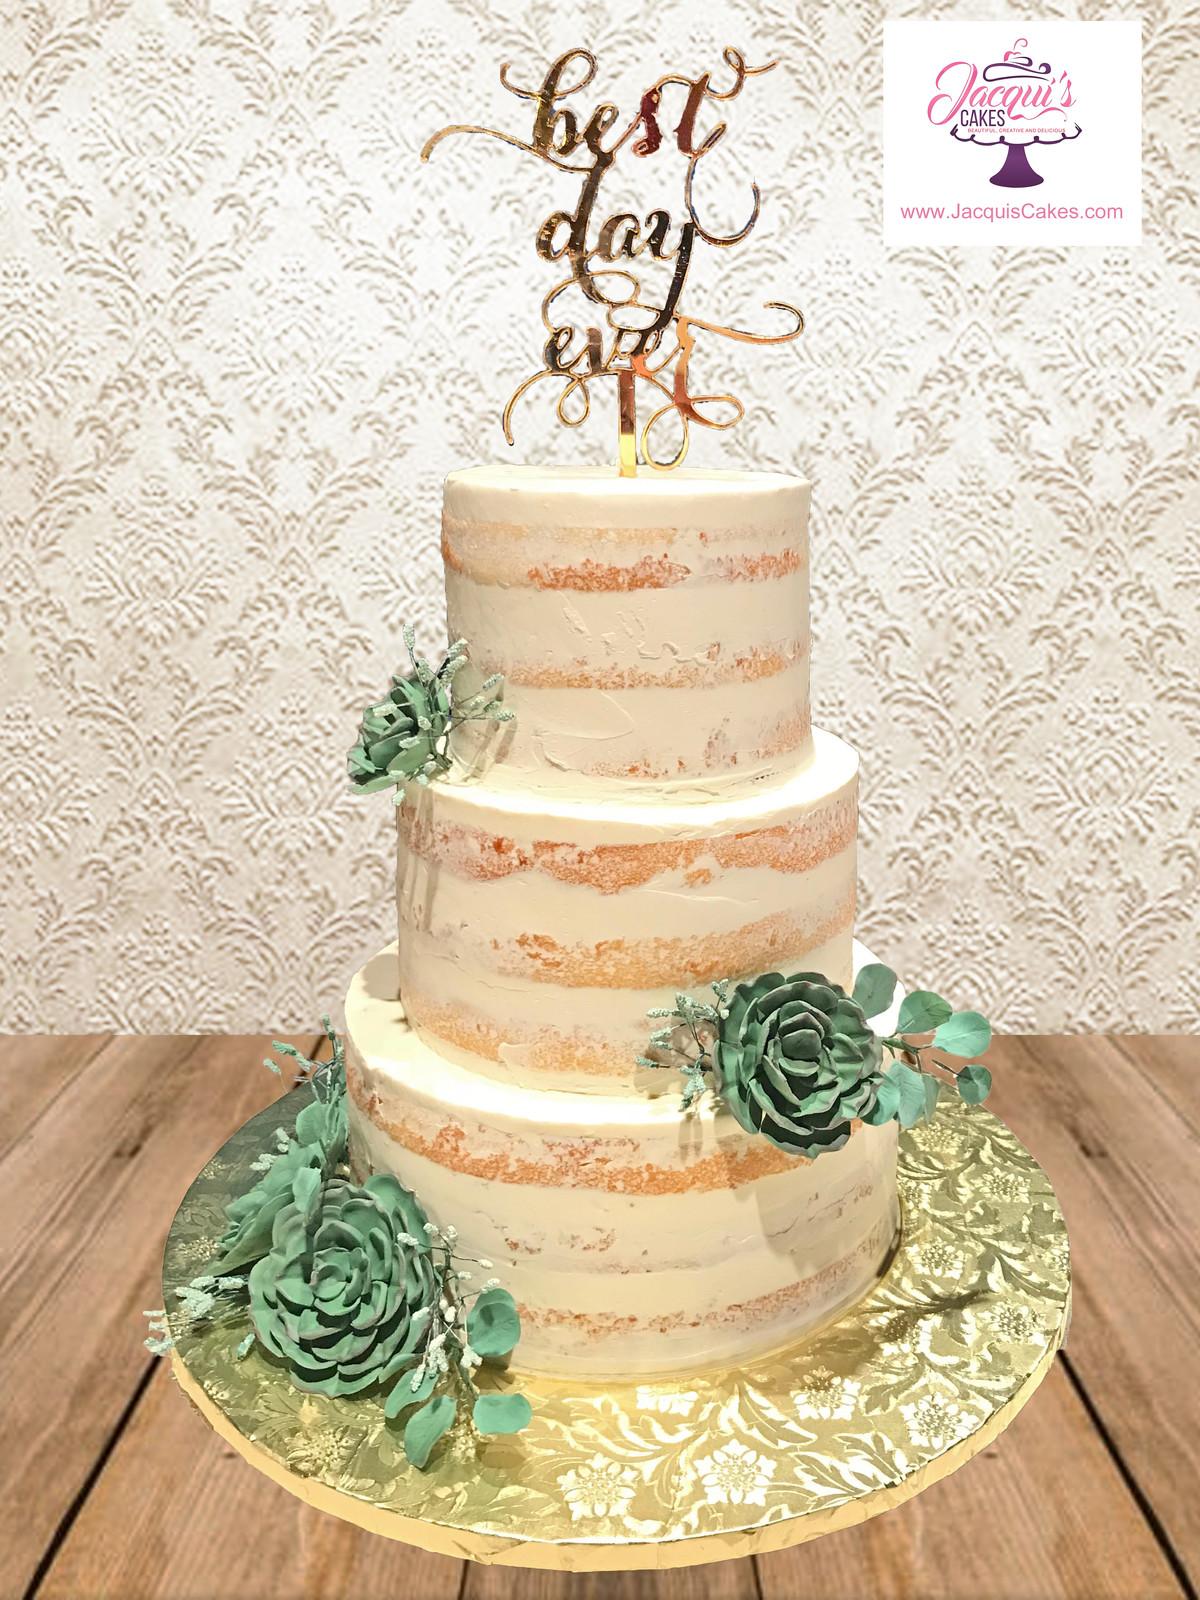 Jacqui\'s Cakes | Buttercream Wedding Cakes